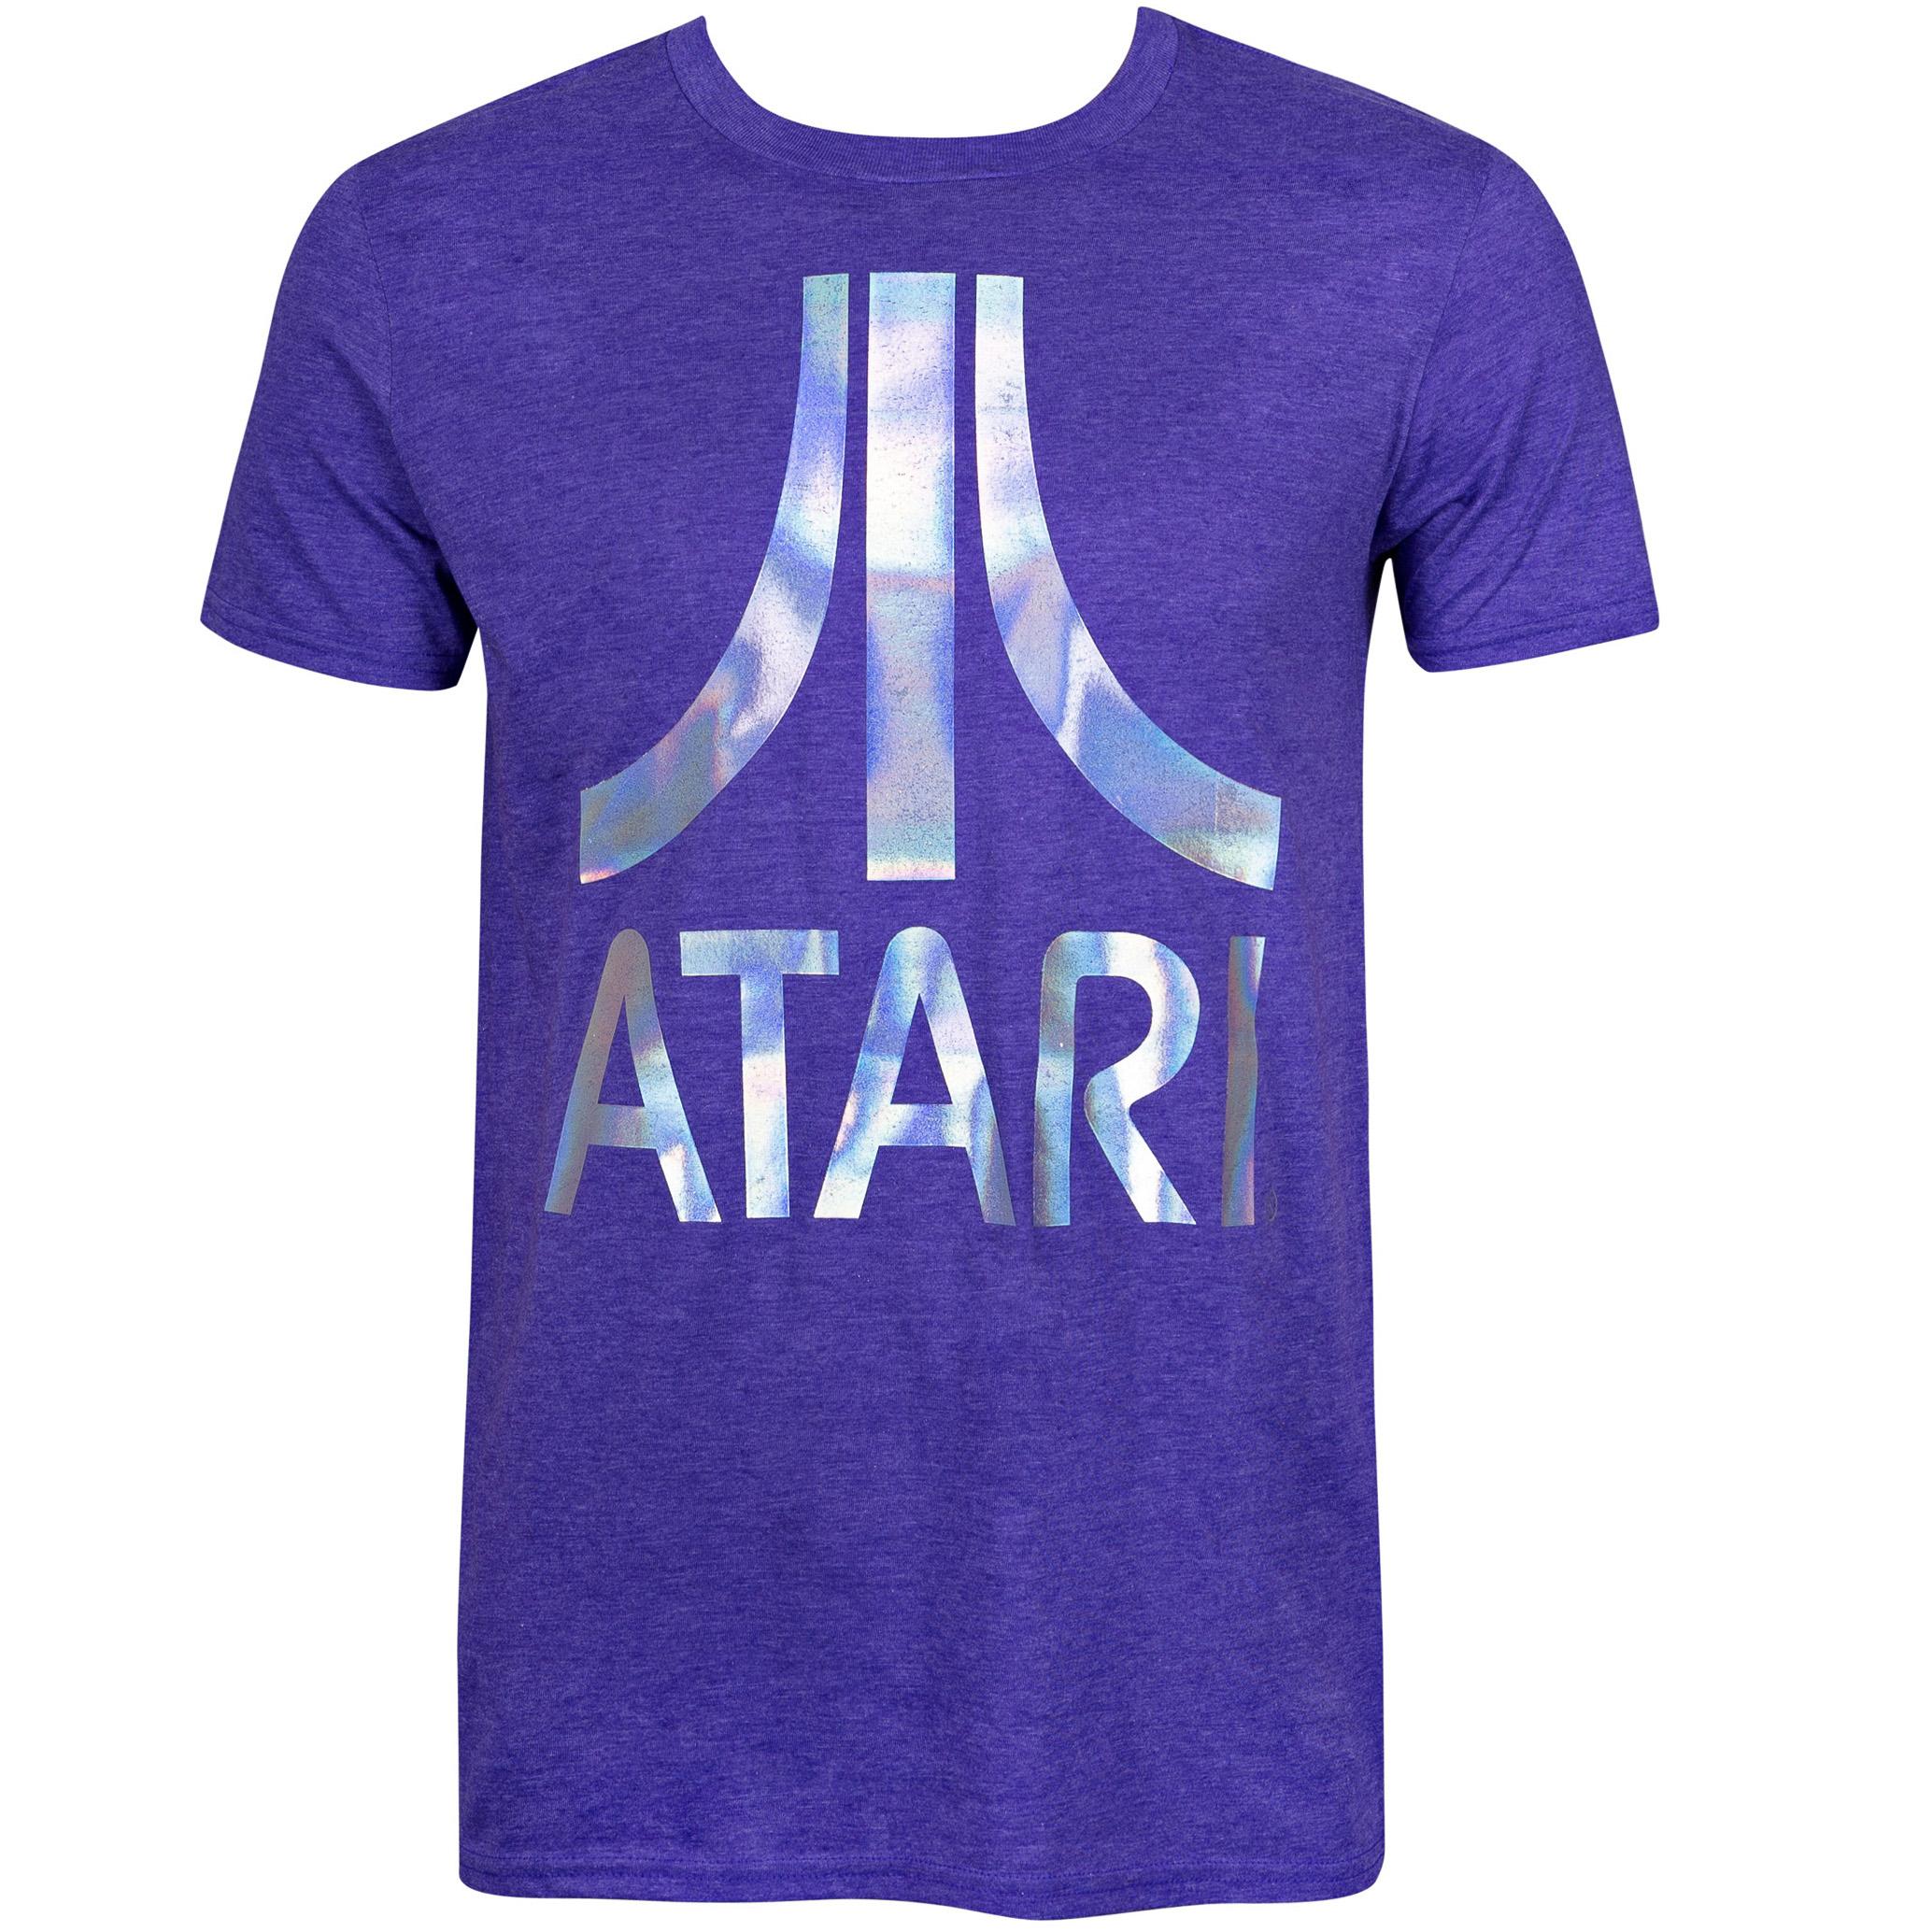 Atari Men's Purple Foil Logo T-Shirt